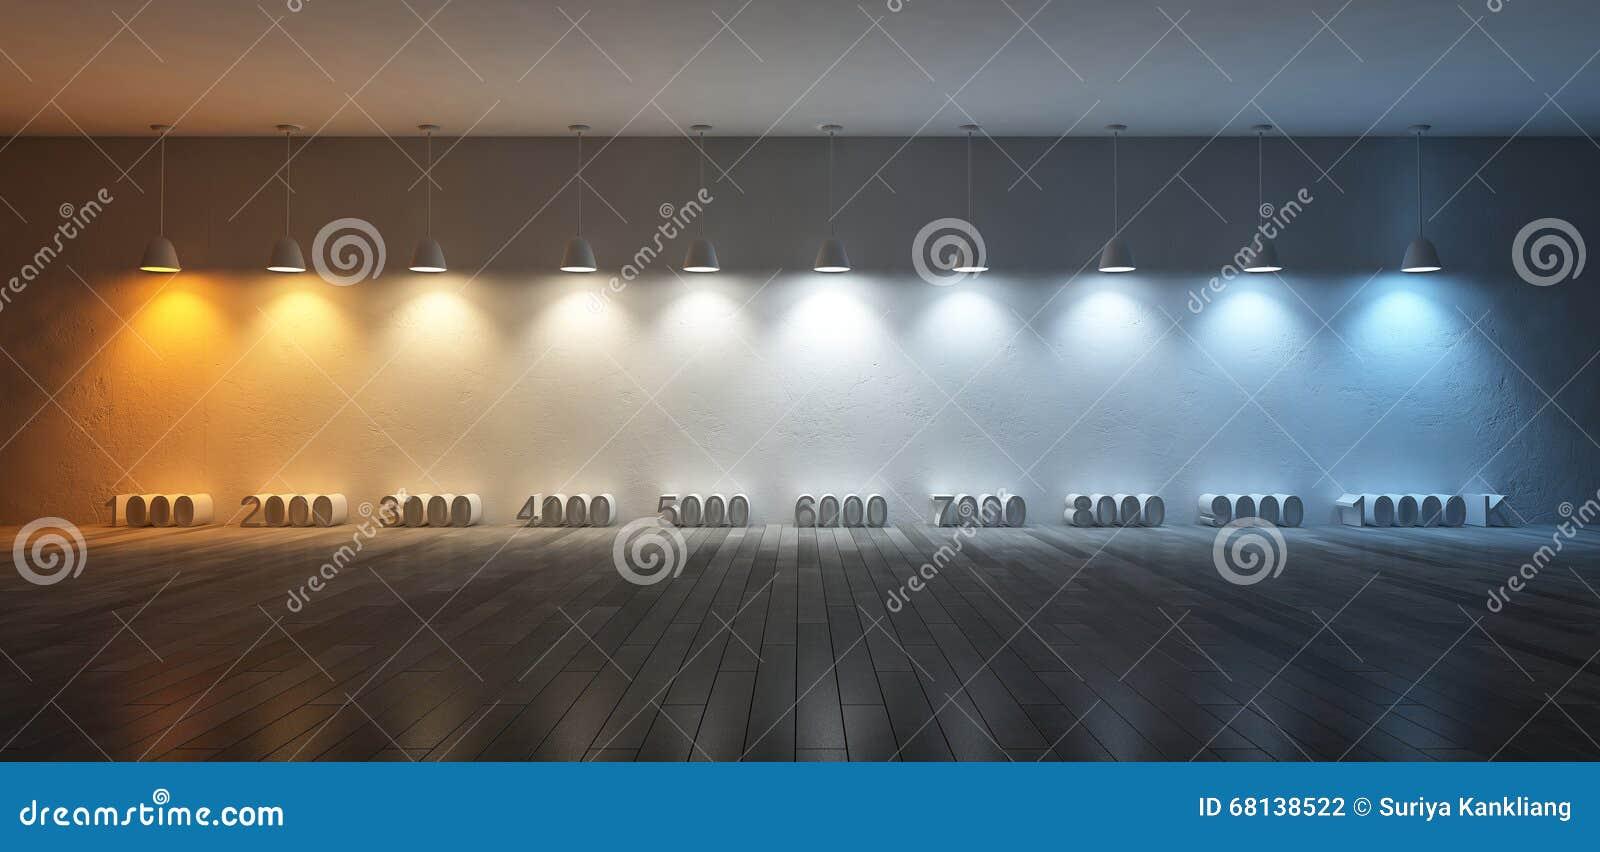 Kelvin Light Scale >> 3Ds Color Temperature Scale Stock Photo - Image: 68138522